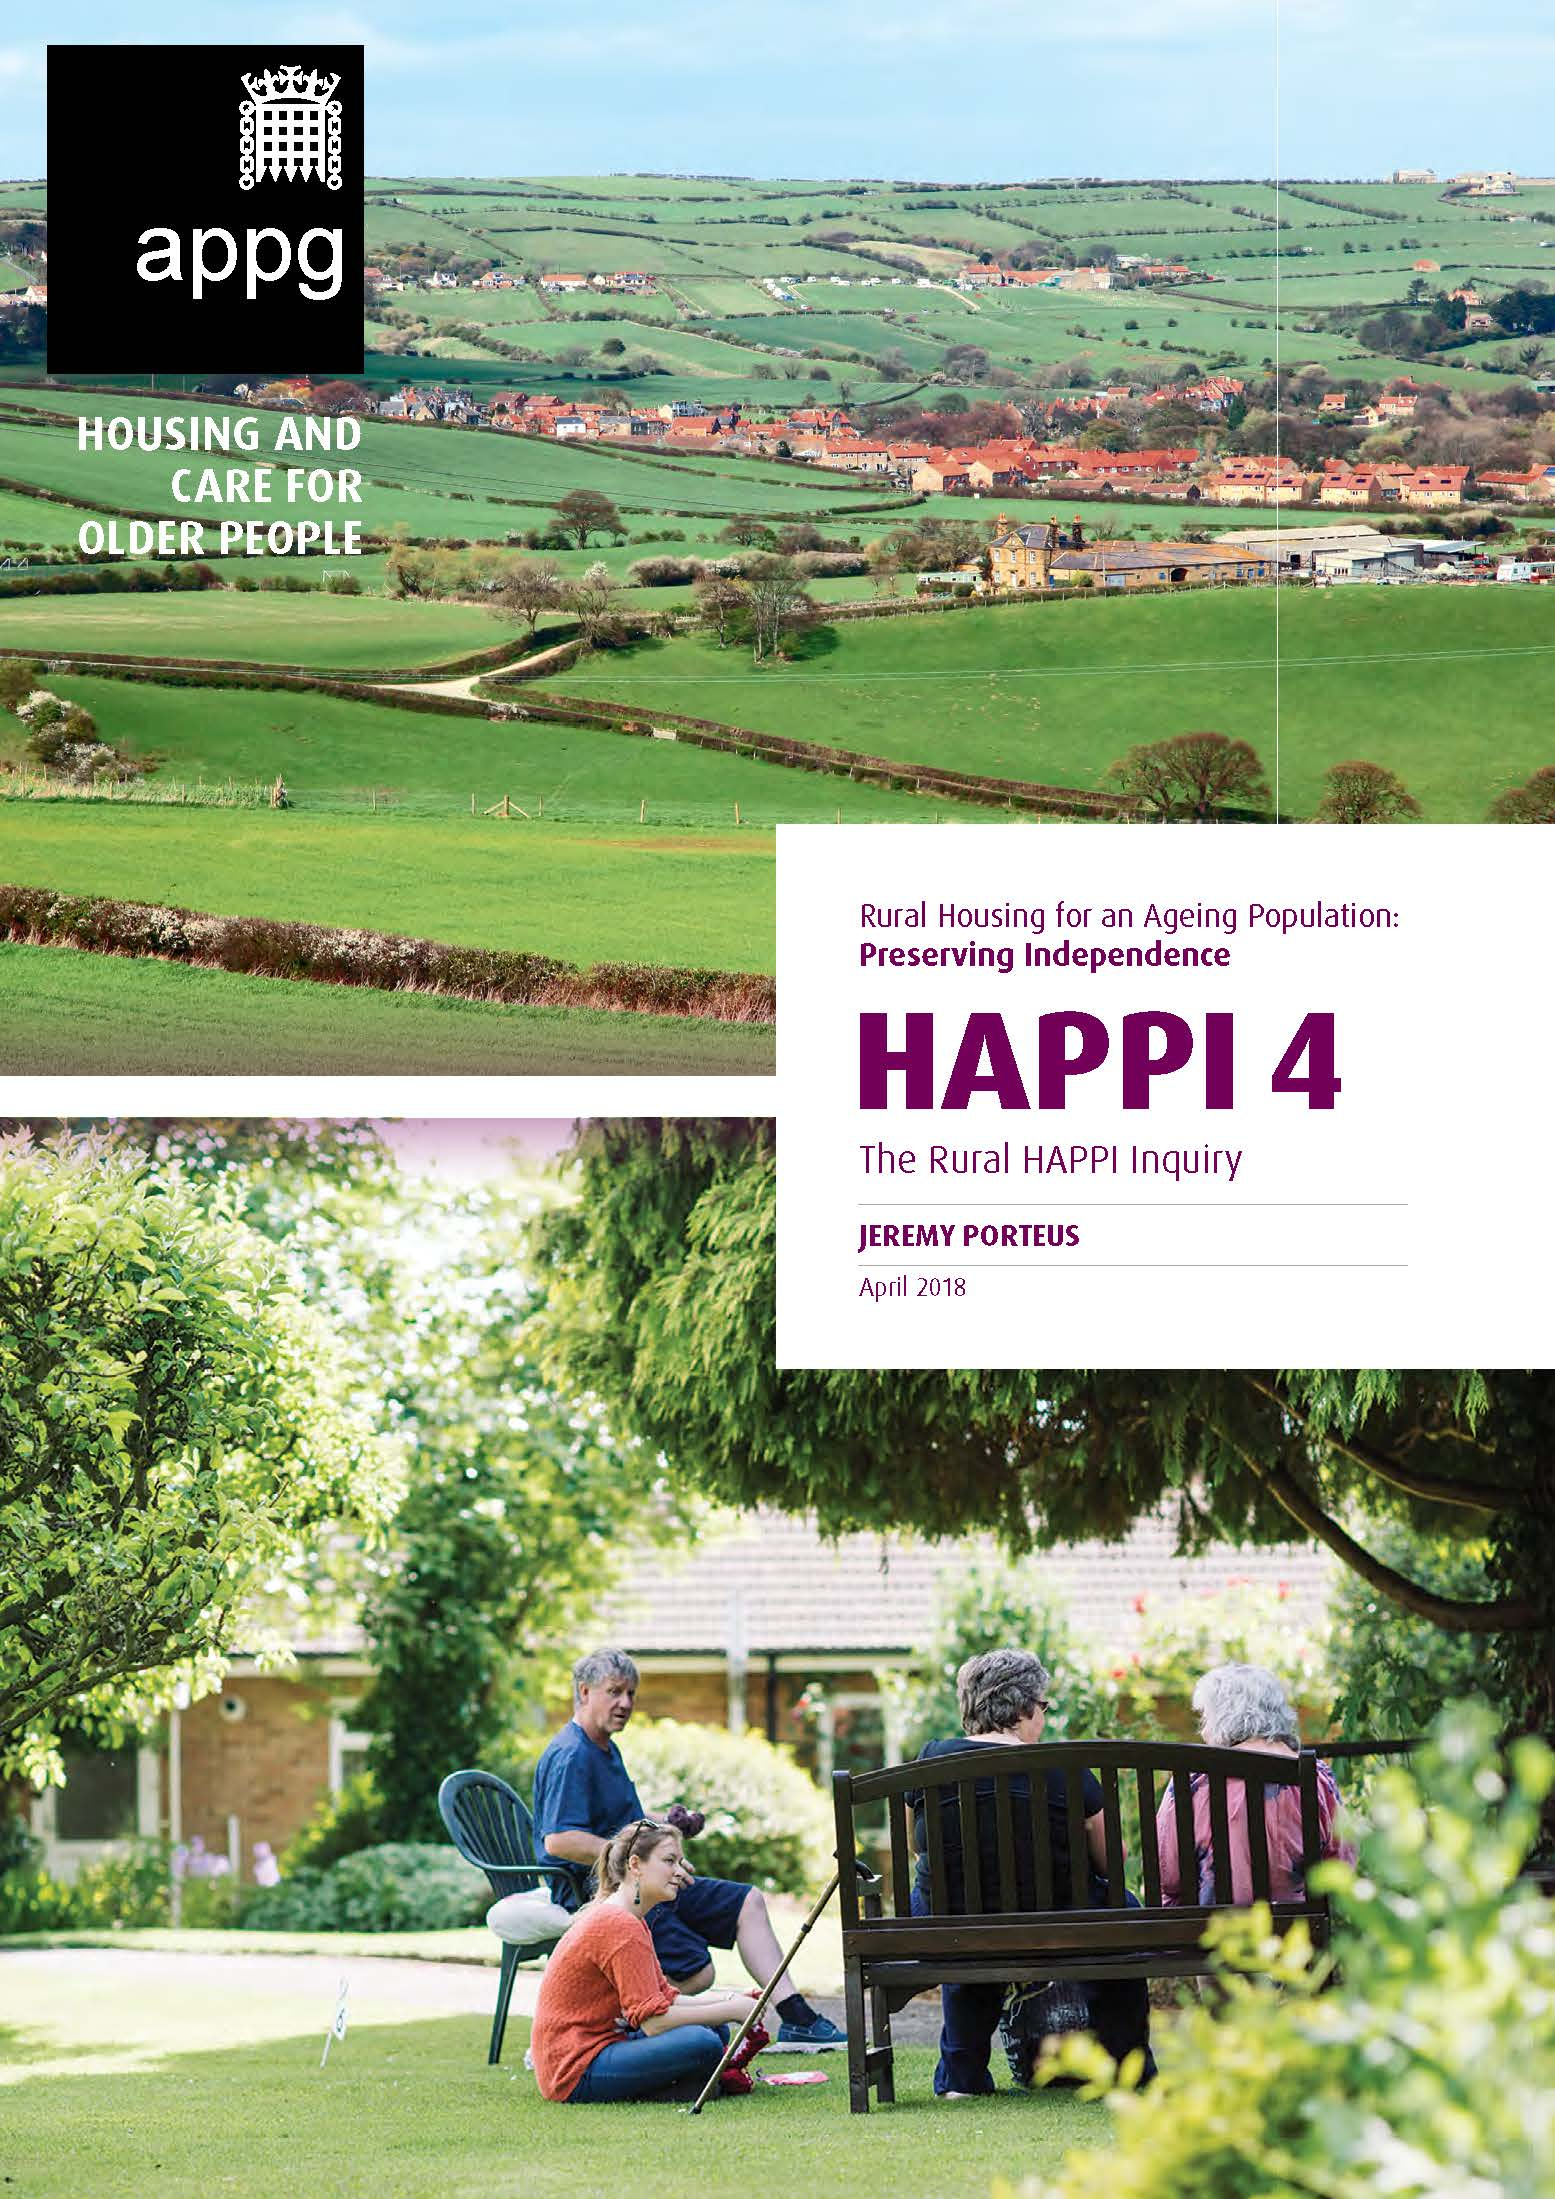 APPG HAPPI 4 Front Cover.jpg